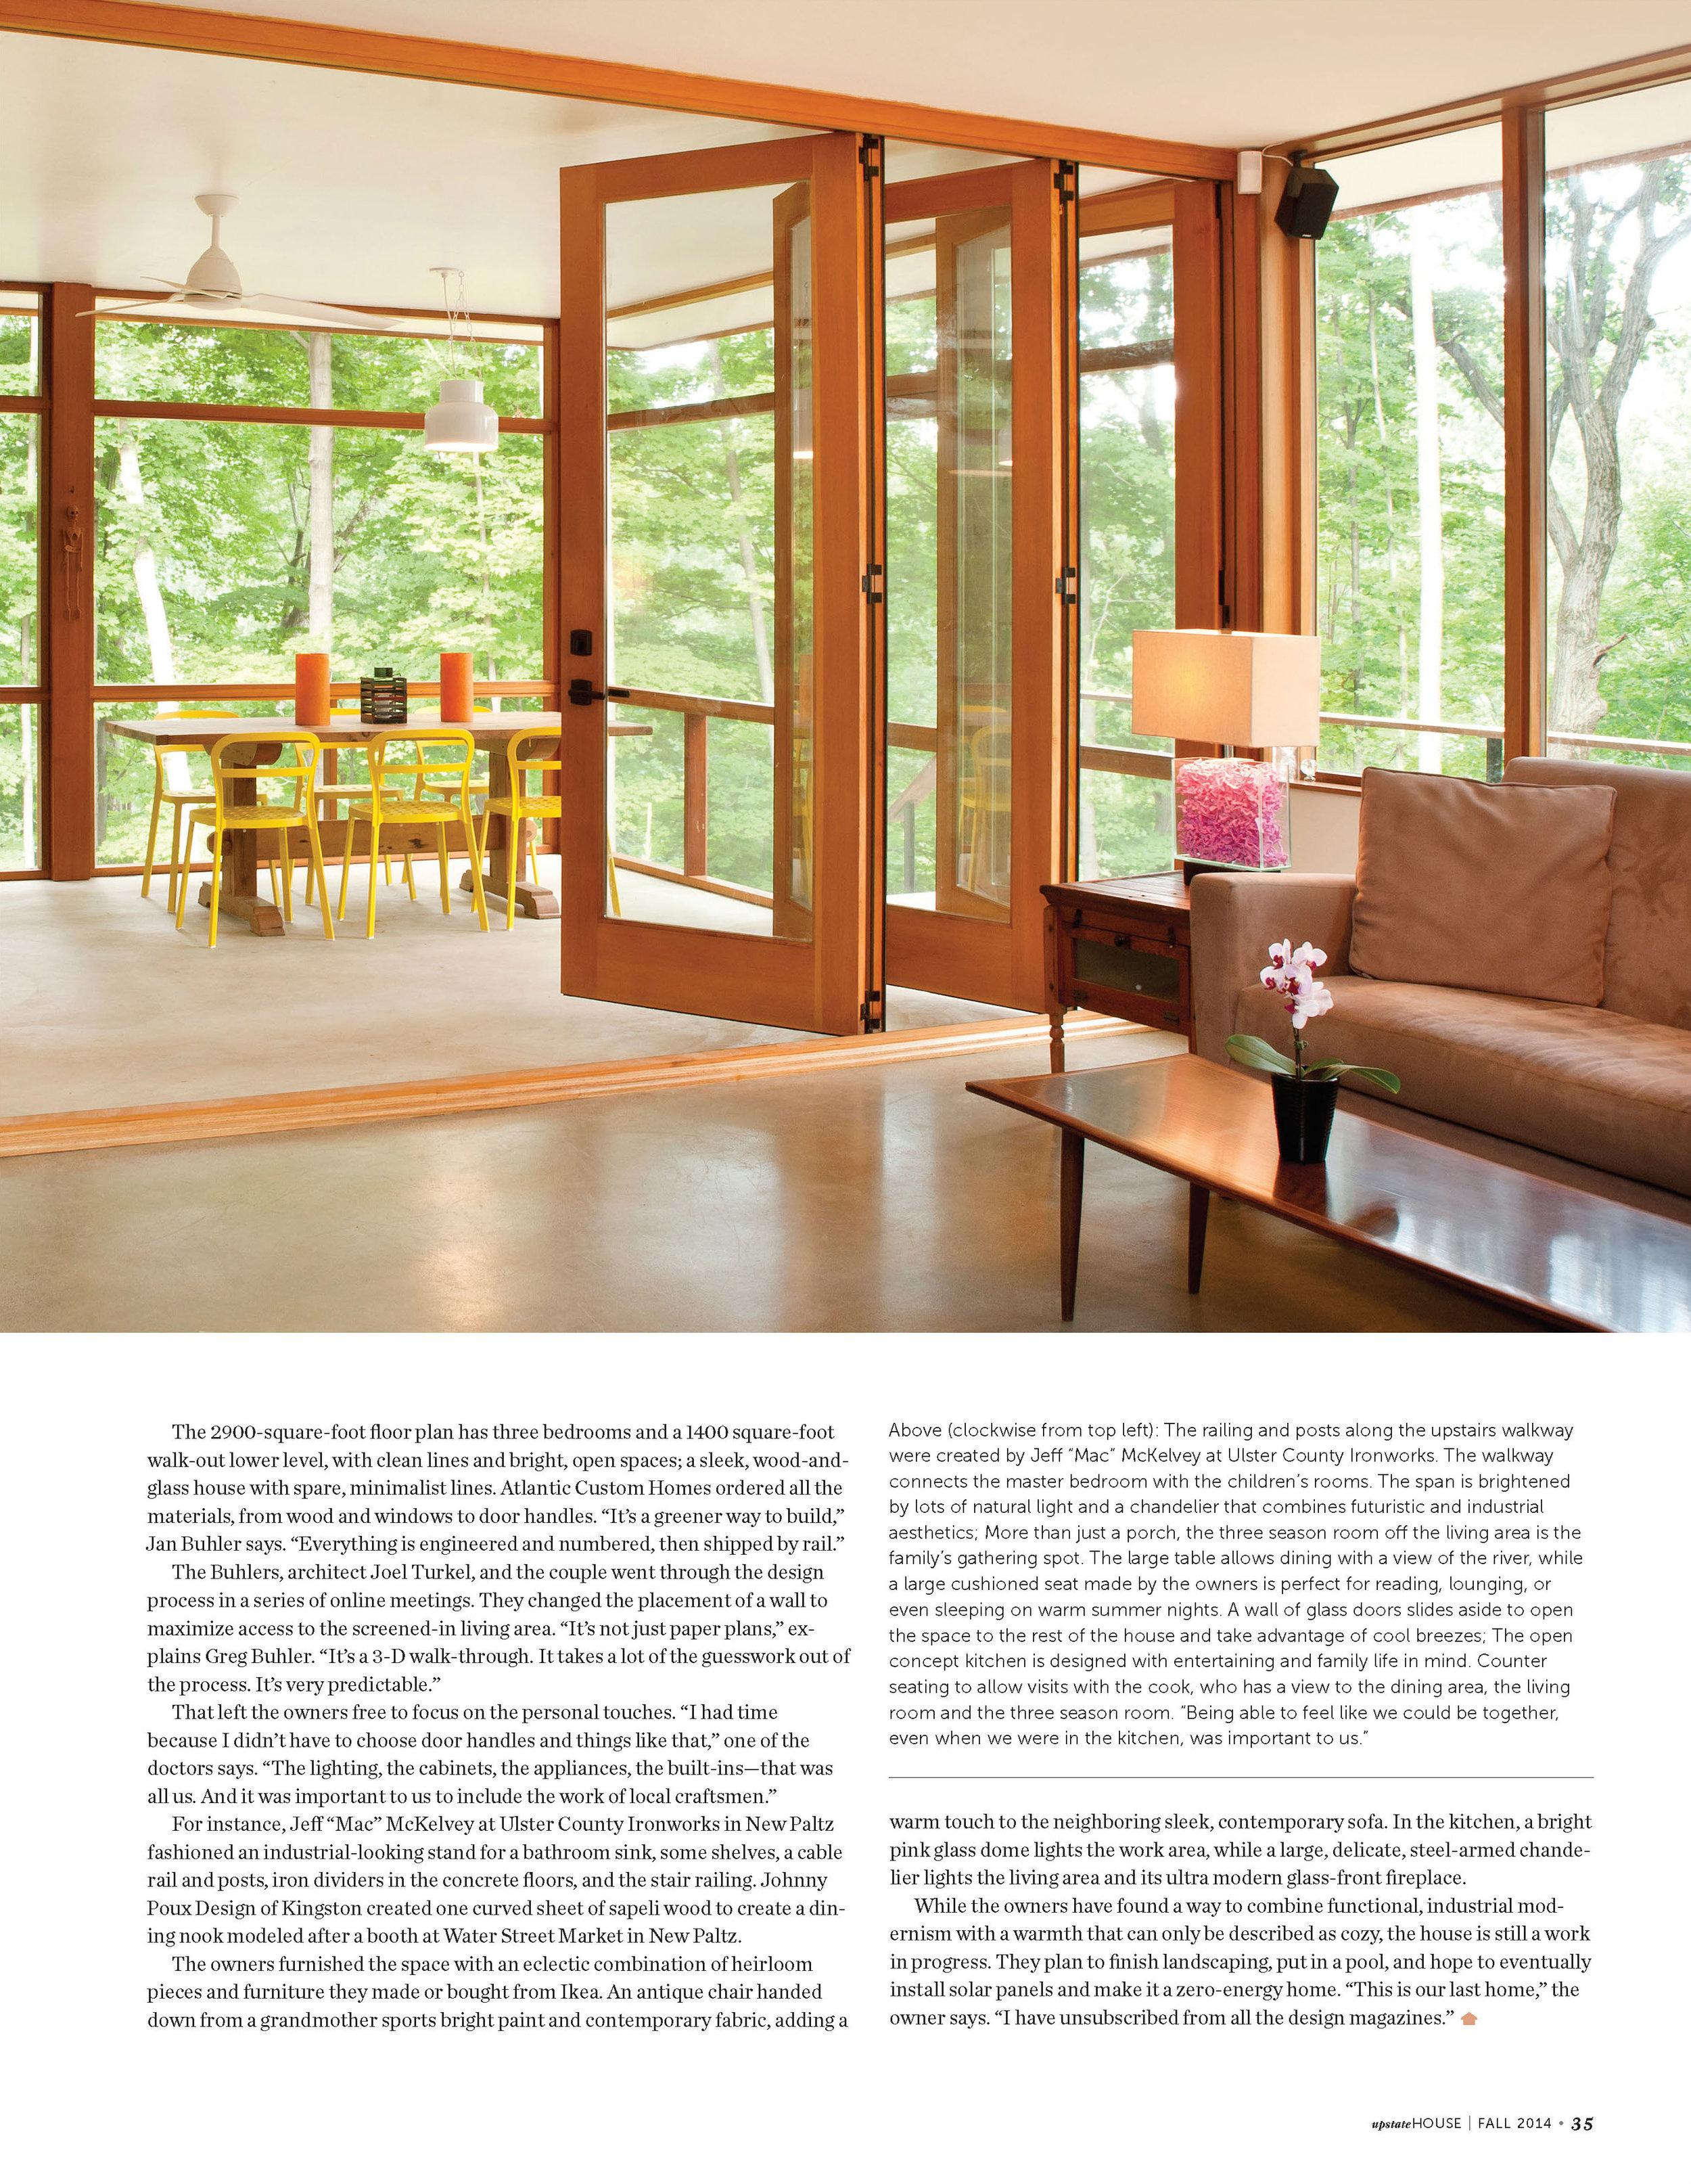 turkel_design_prefab_home_upstateny_press3.jpg